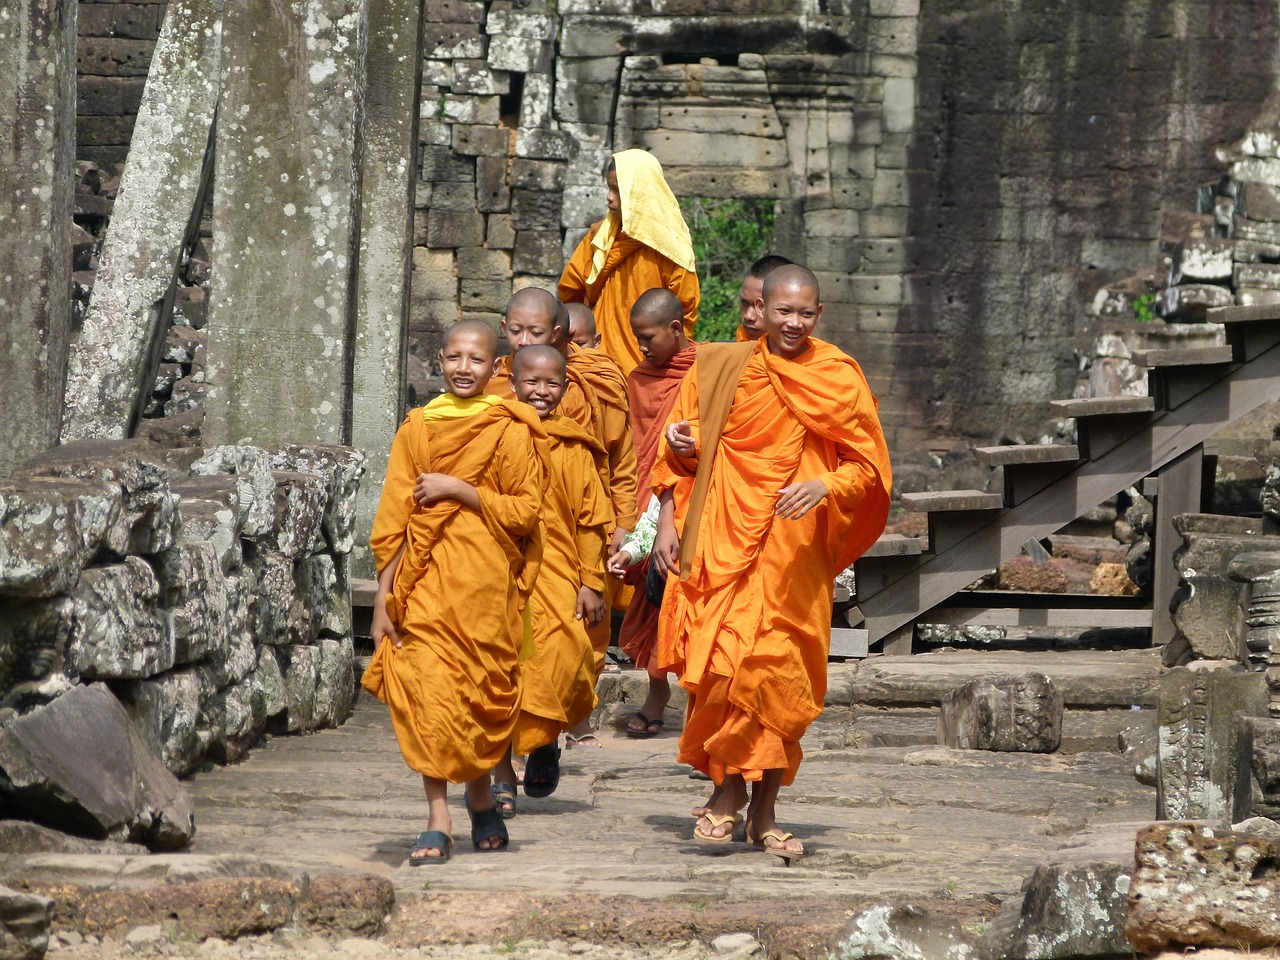 região turistica camboja